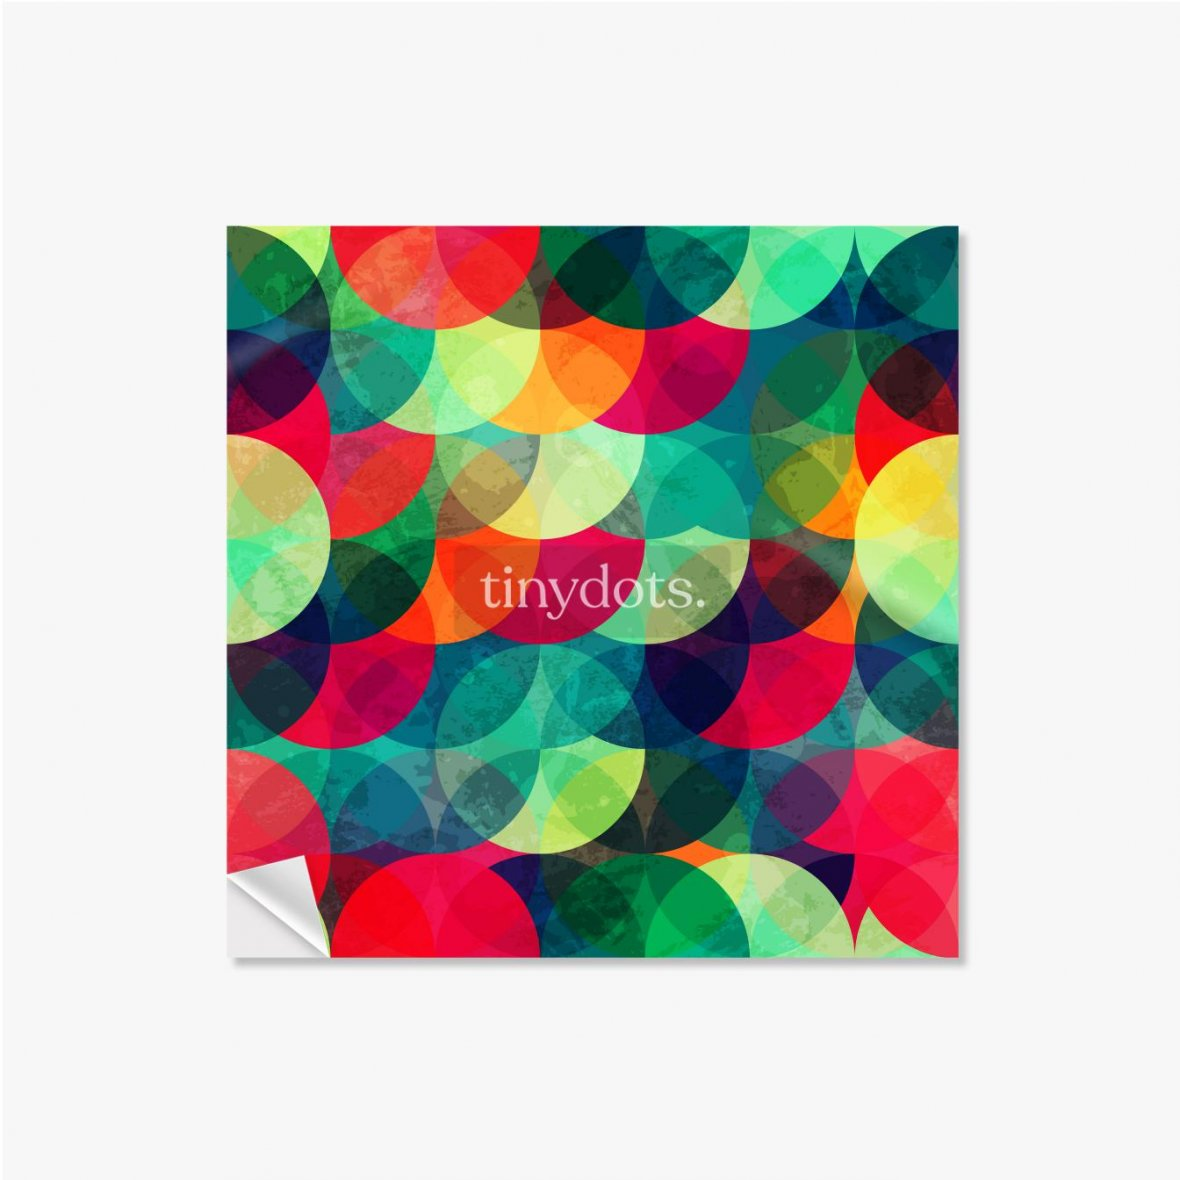 Selbstklebende Poster Buntes kreisförmiges nahtloses Muster mit Grunge-Effekt